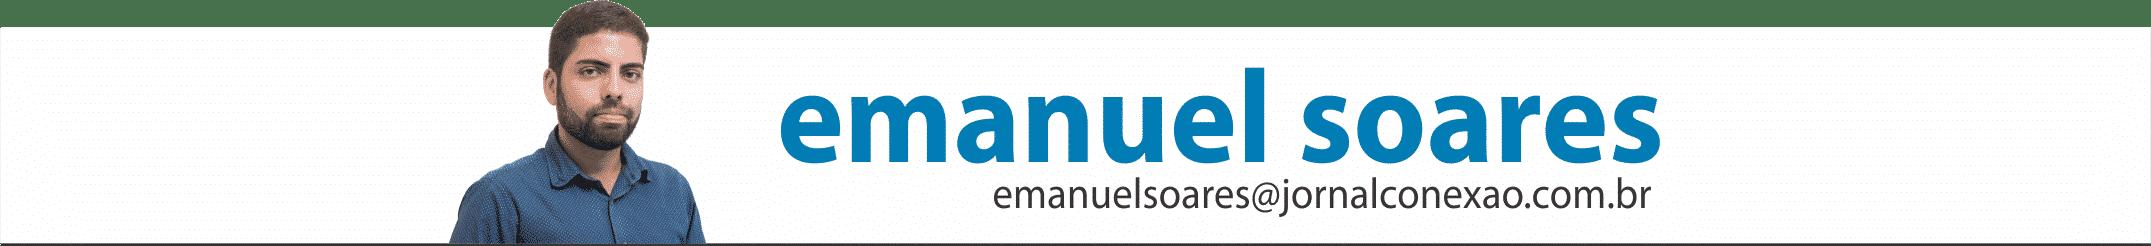 Emanuel Soares: